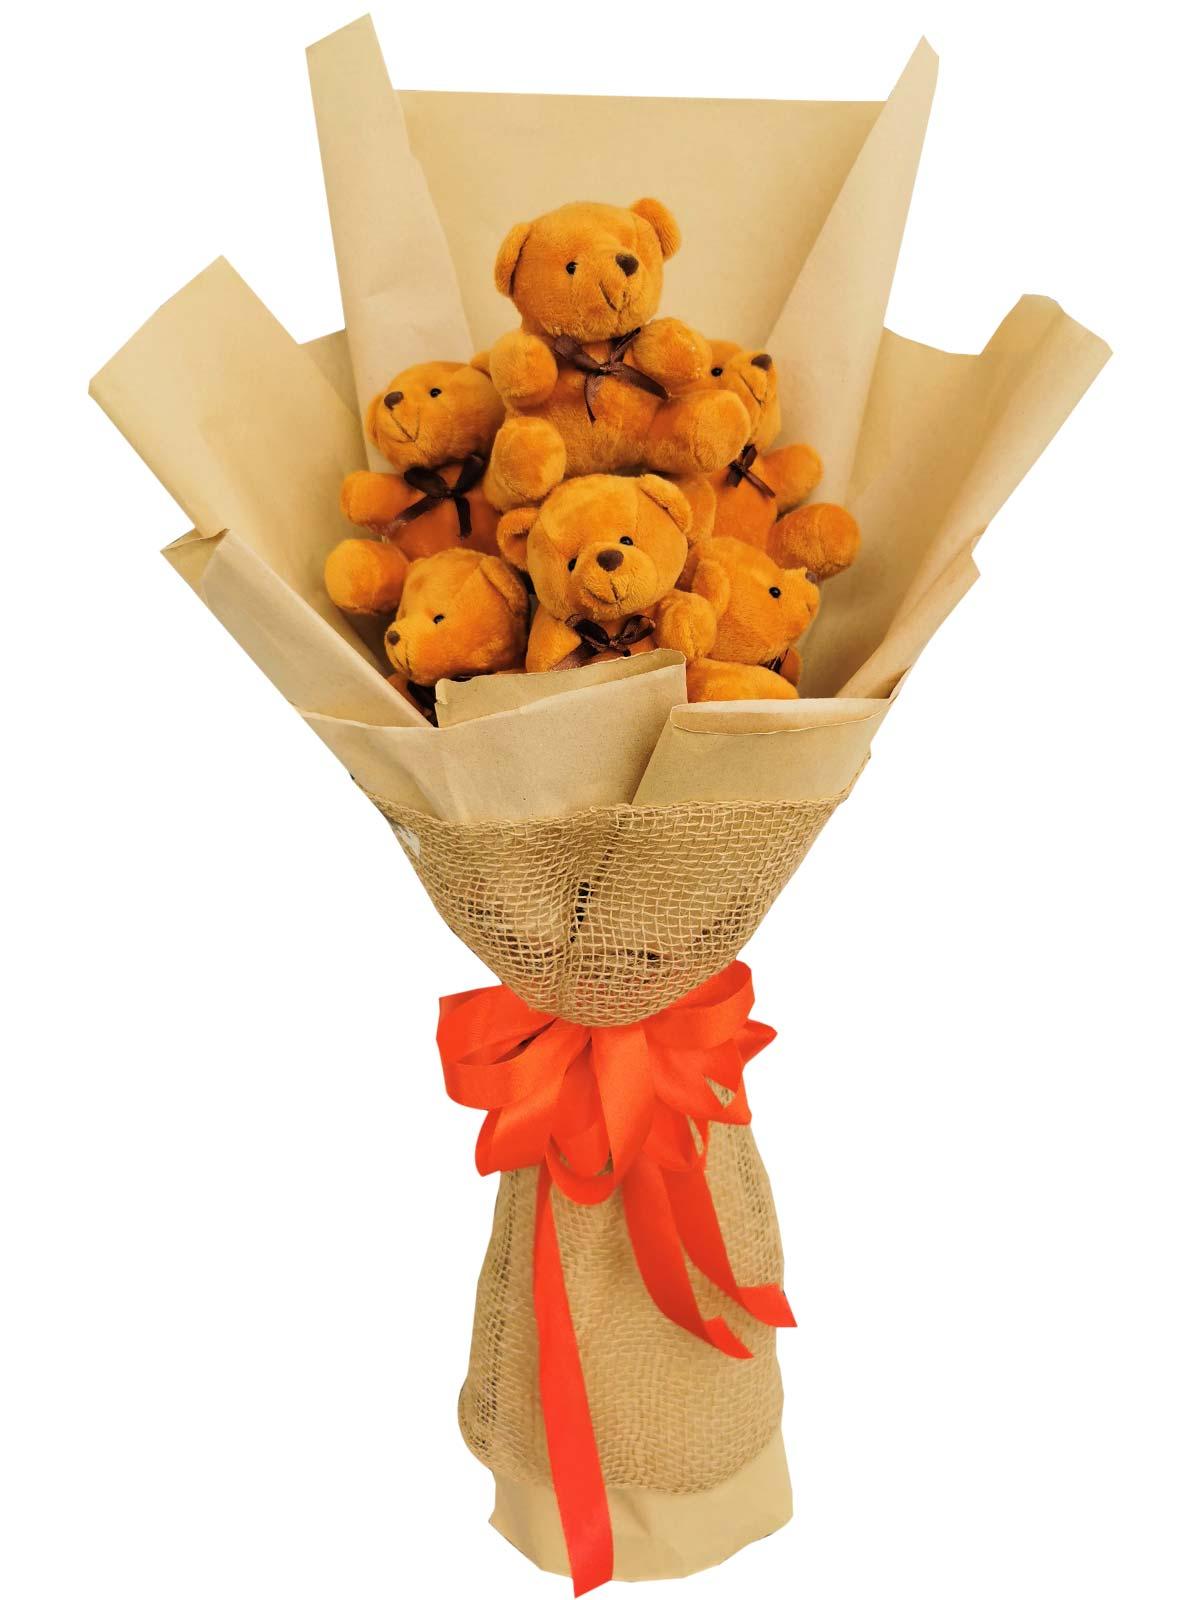 6 Small Brown Teddy Bears; W: Kraft & Jute